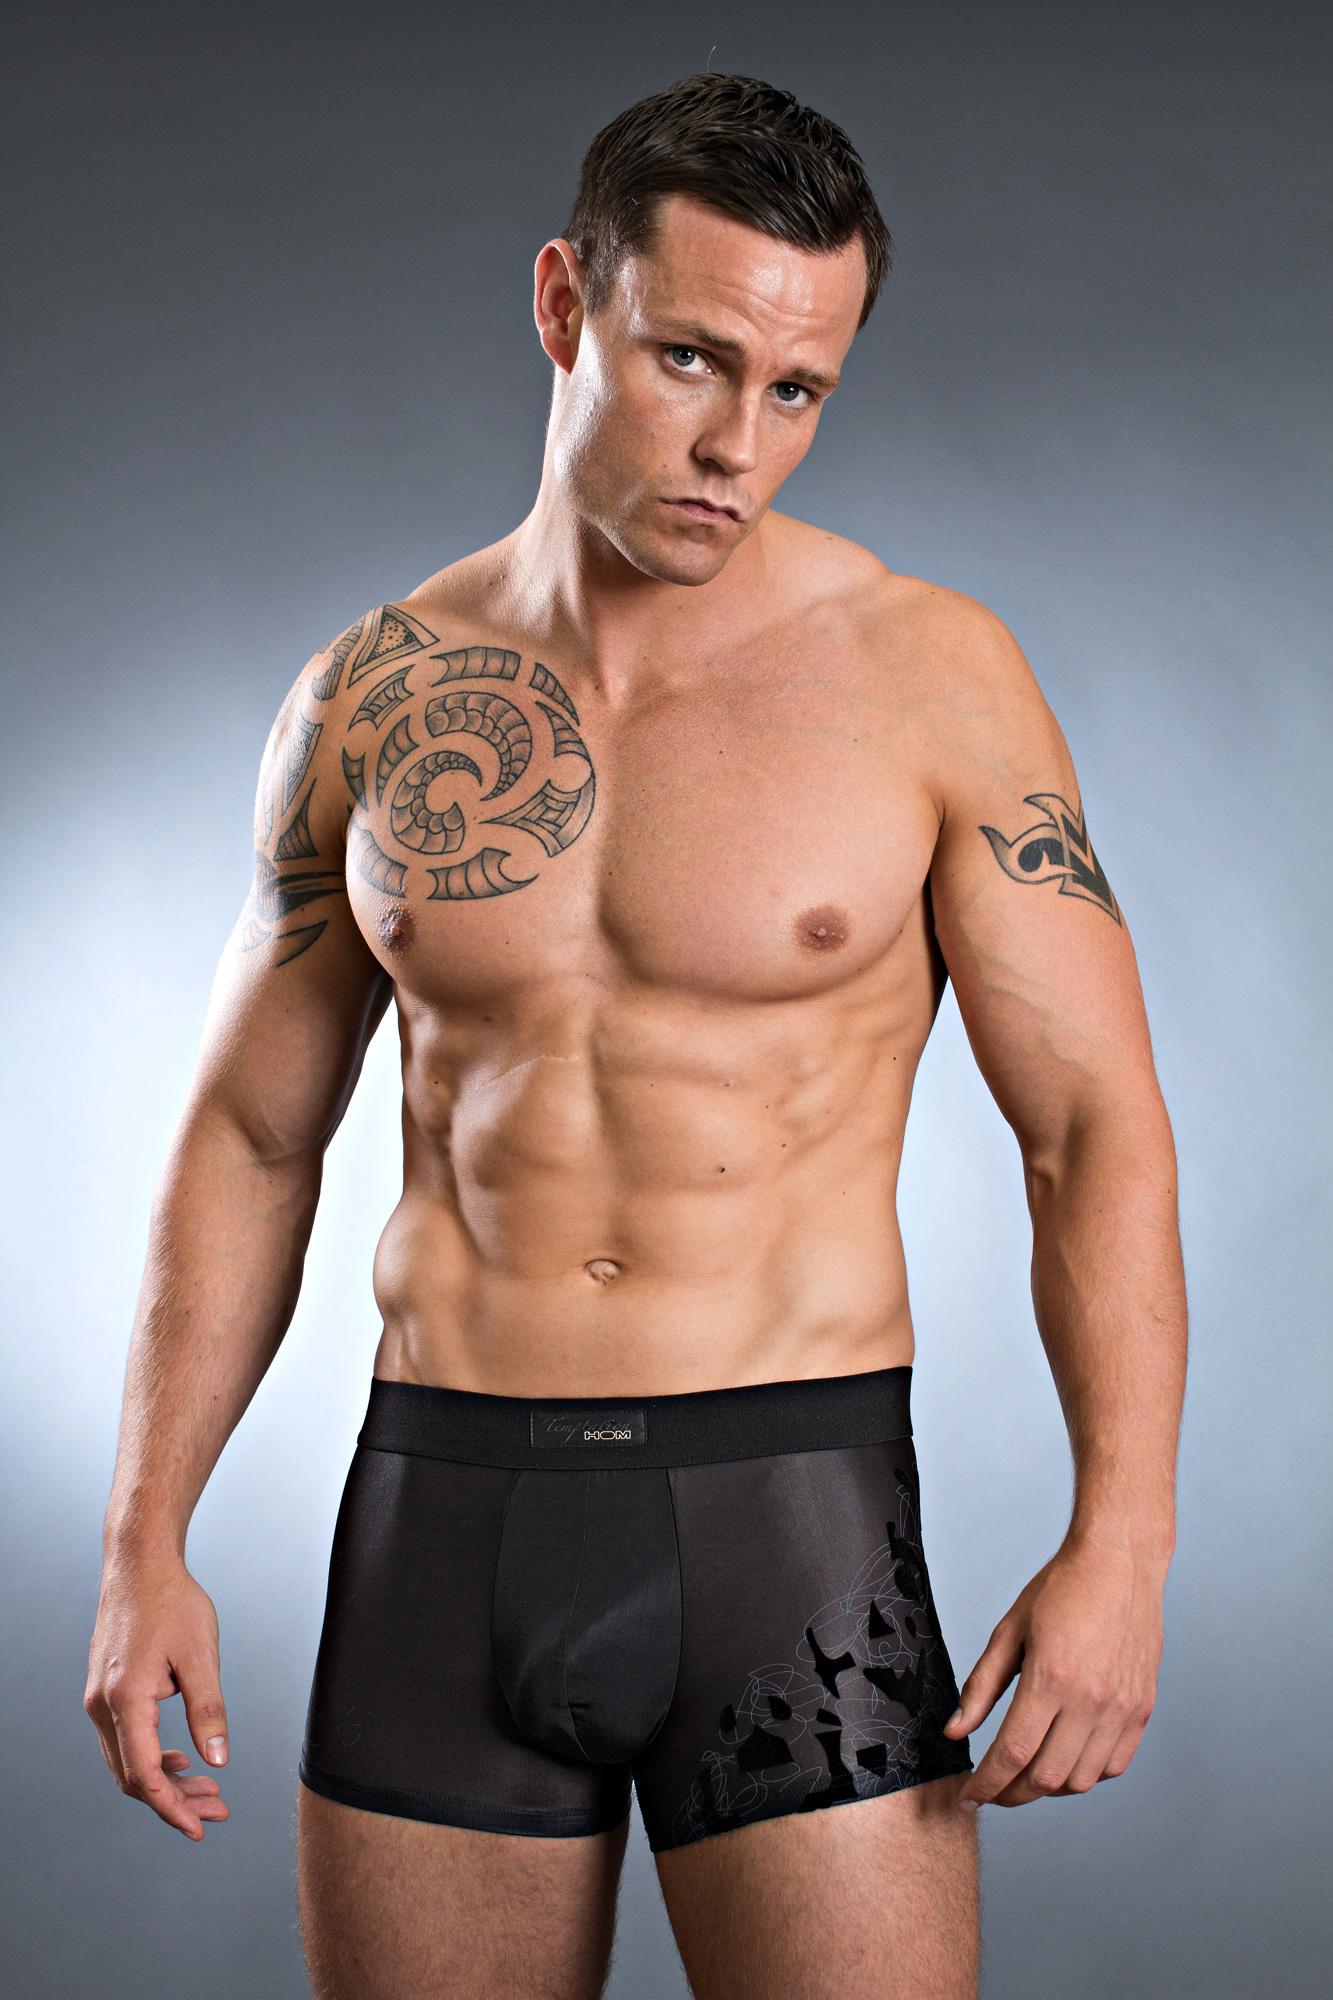 New season HOM men's underwear styles now arriving at ...